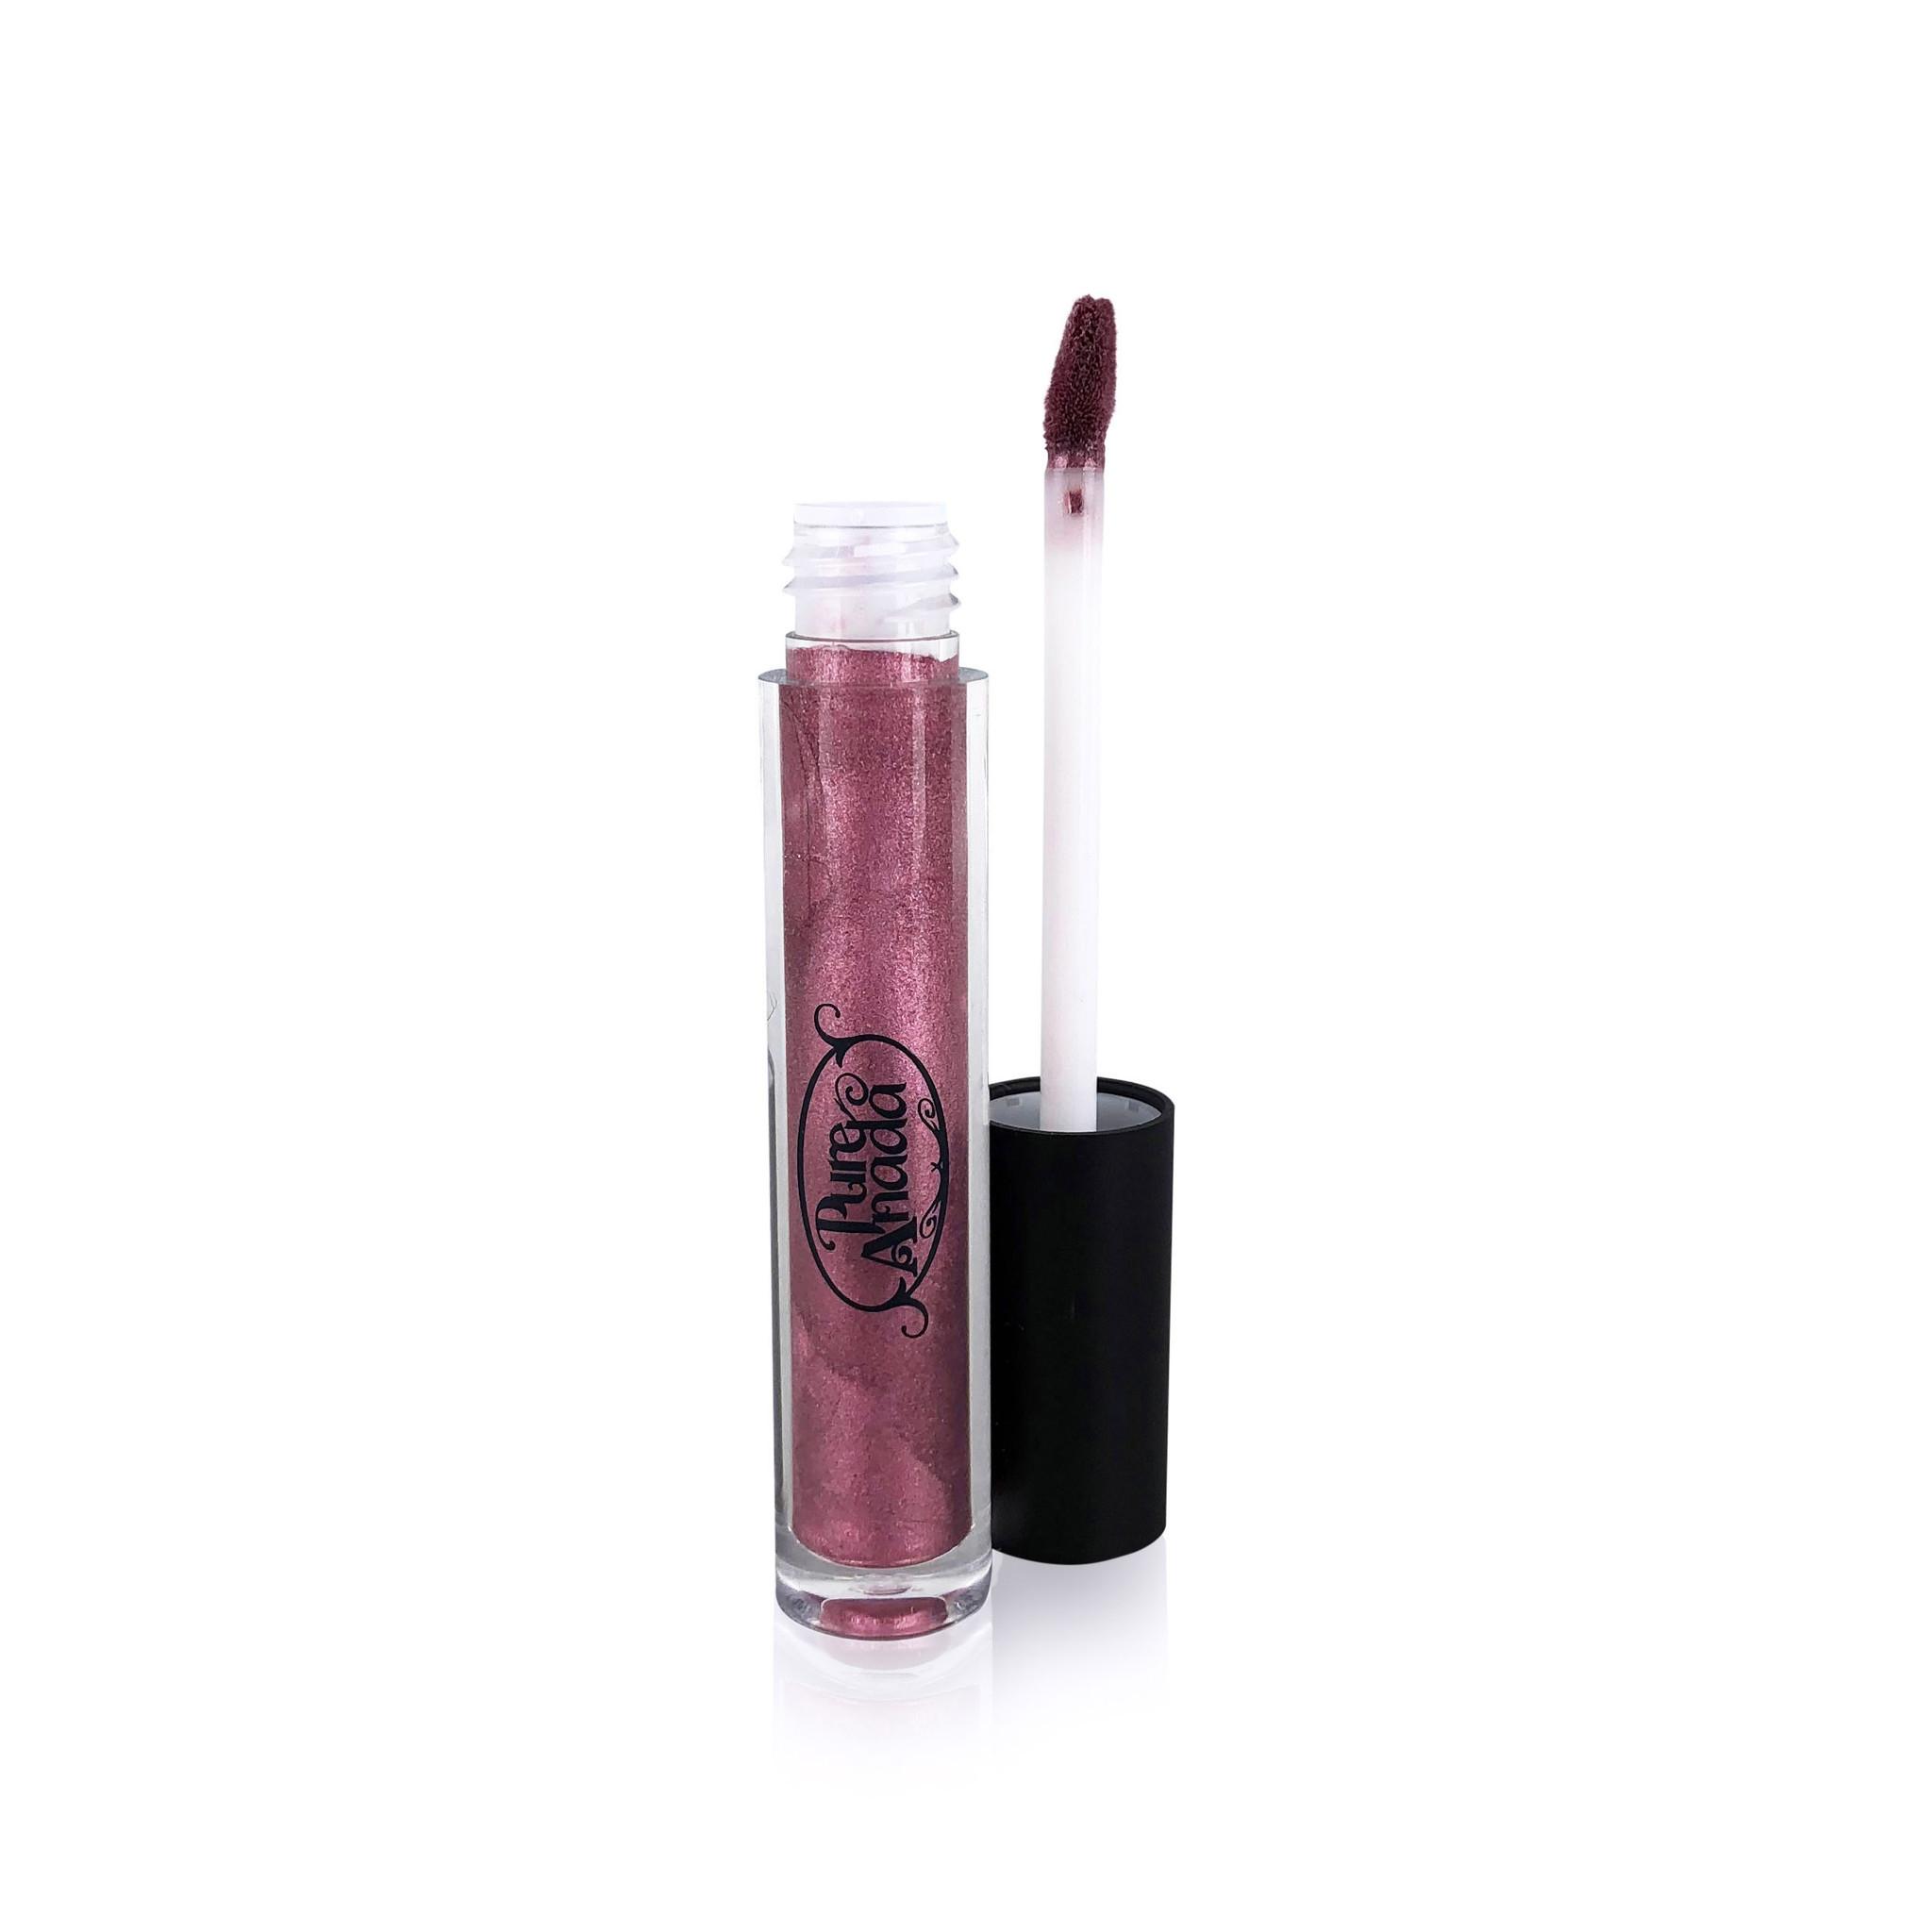 Glisten Mineral Lip Gloss - Amethyst-2